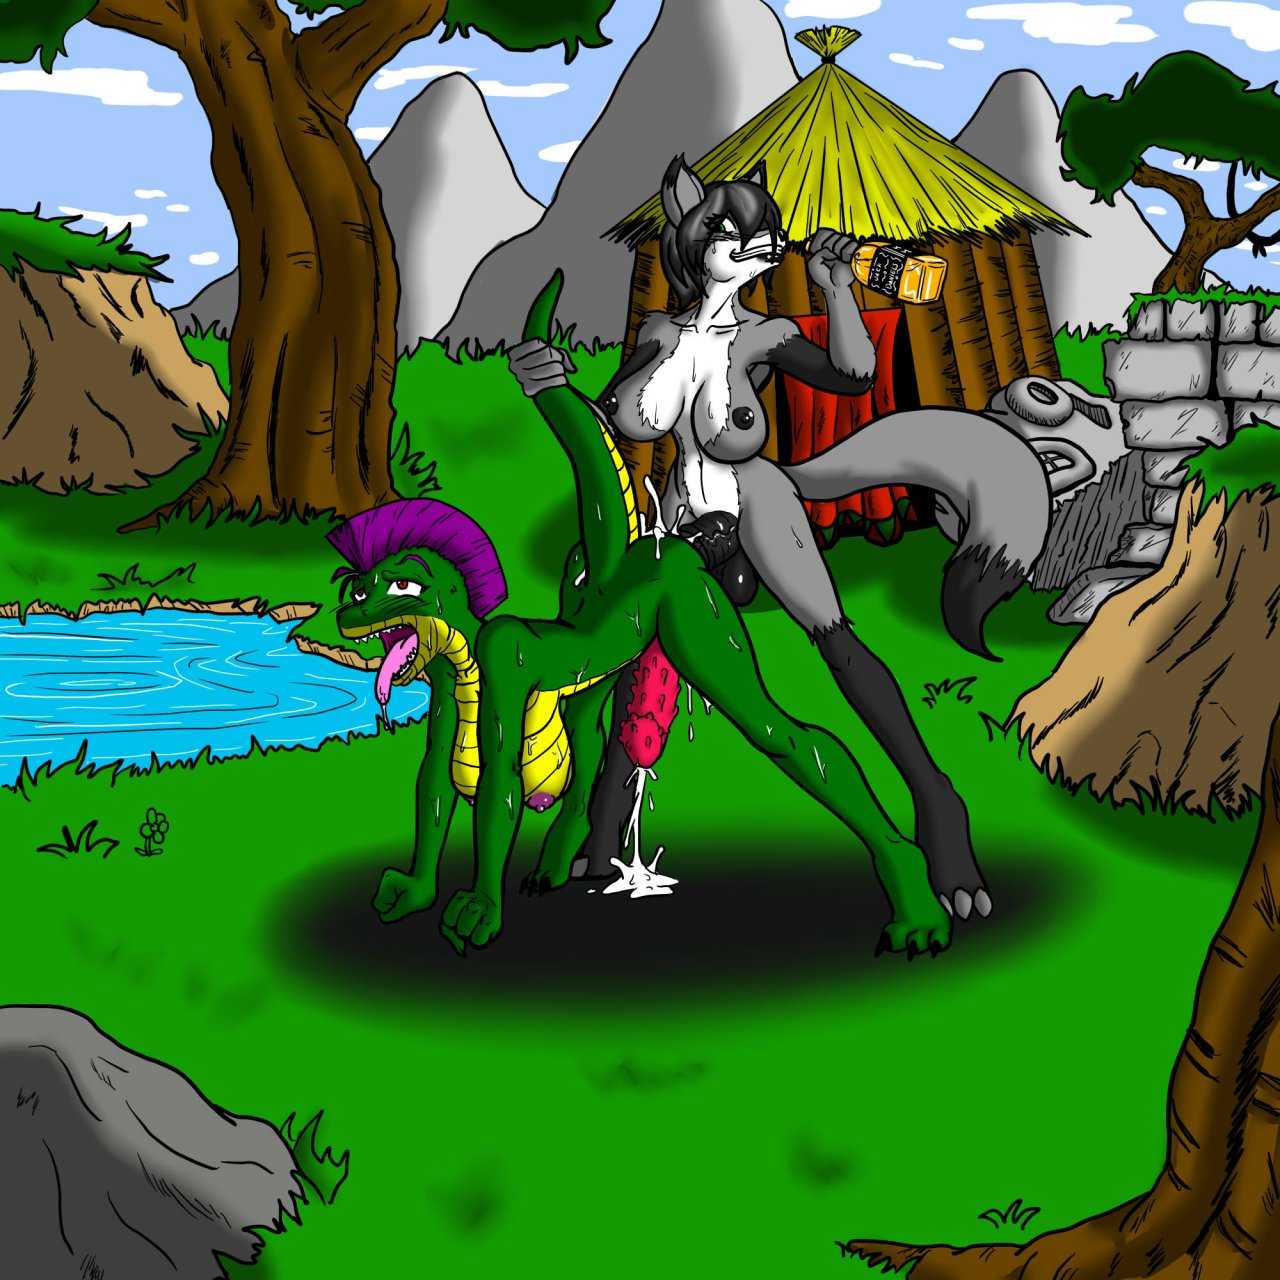 sekiro of o rin water What is yee dinosaur from